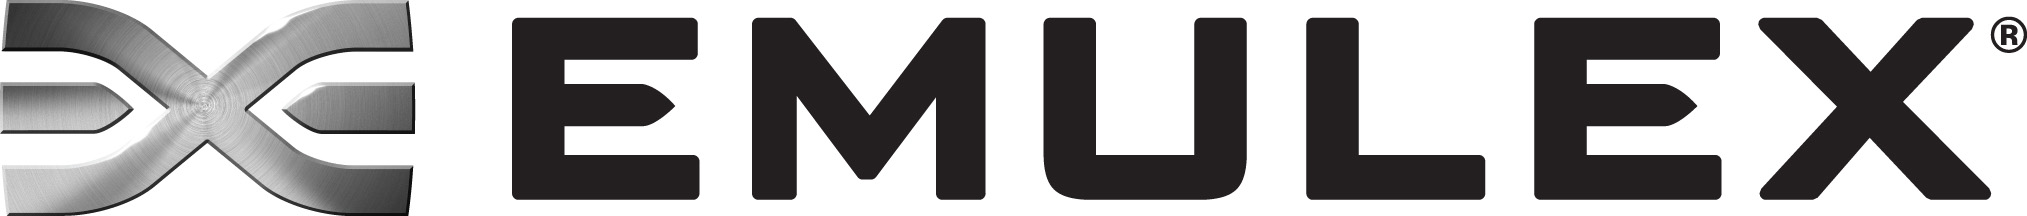 Emulex Corporation Logo